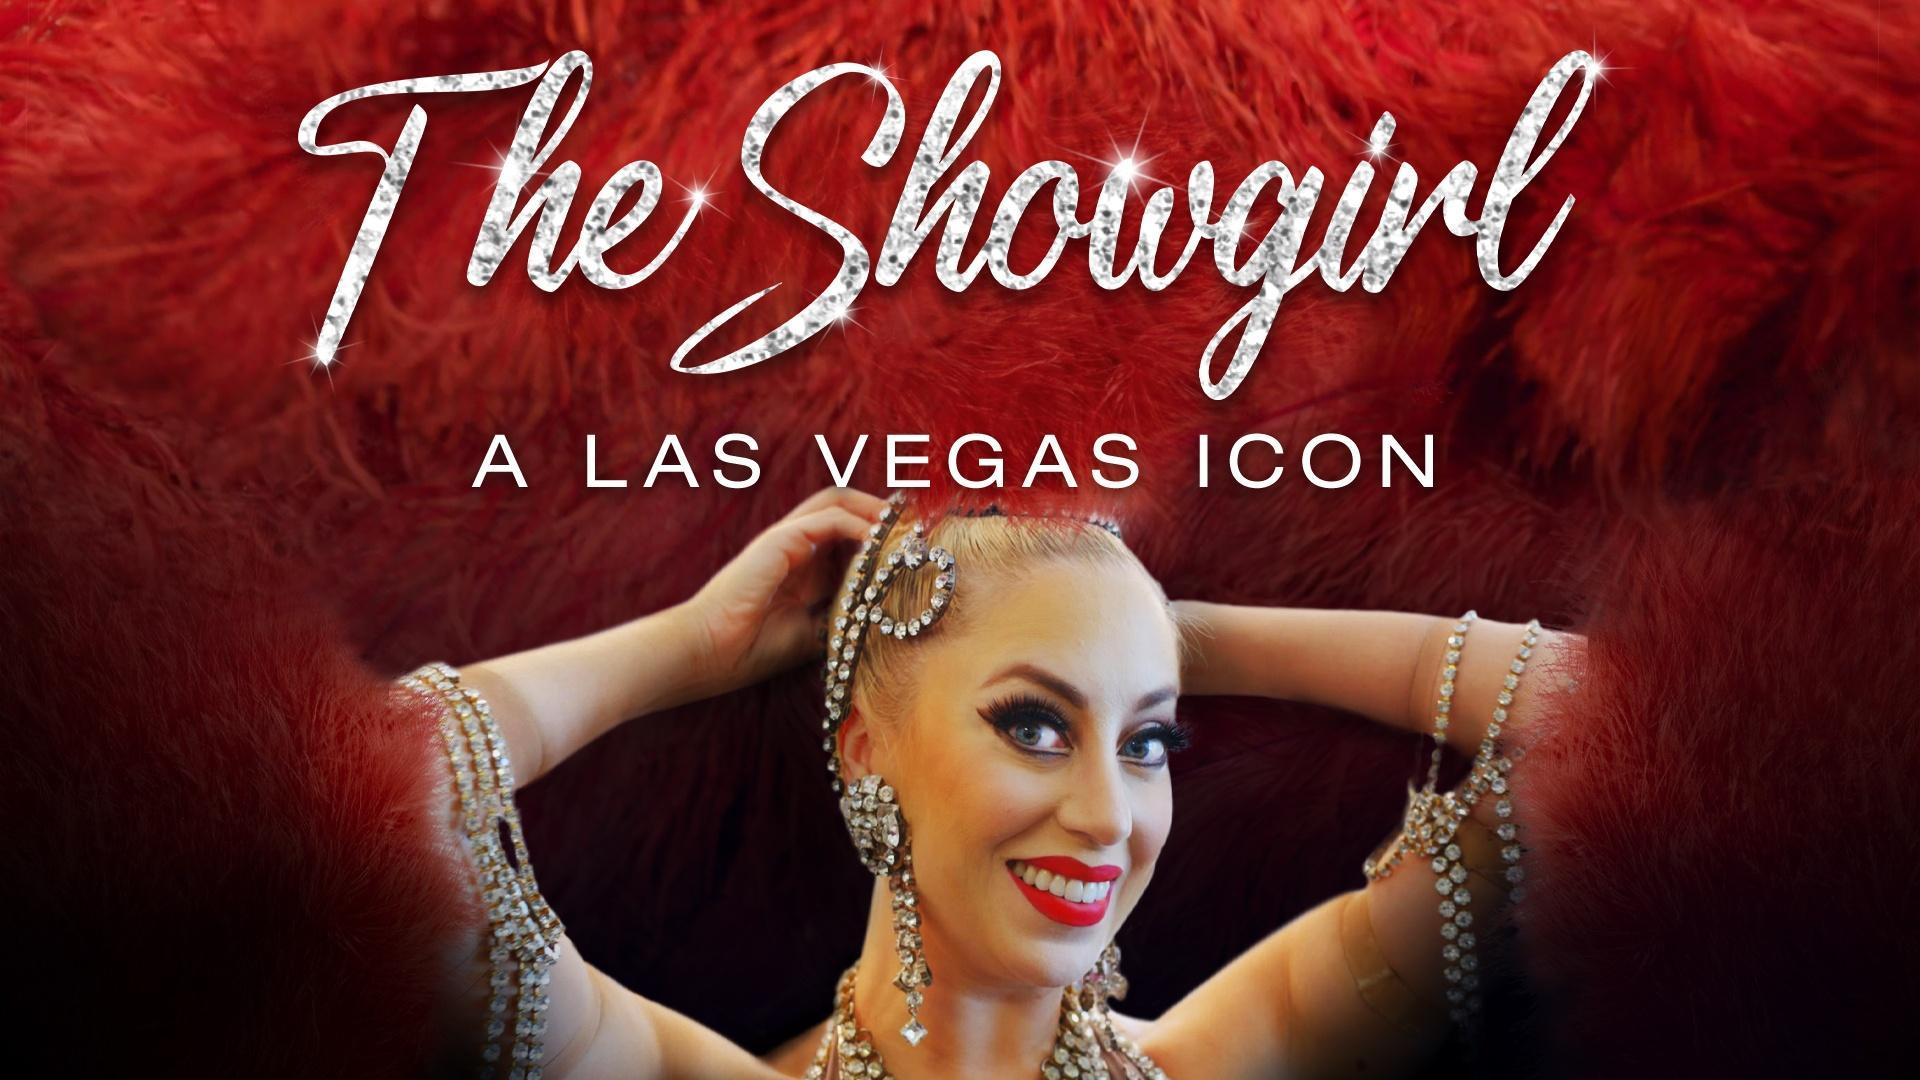 Showgirl: A Las Vegas Icon